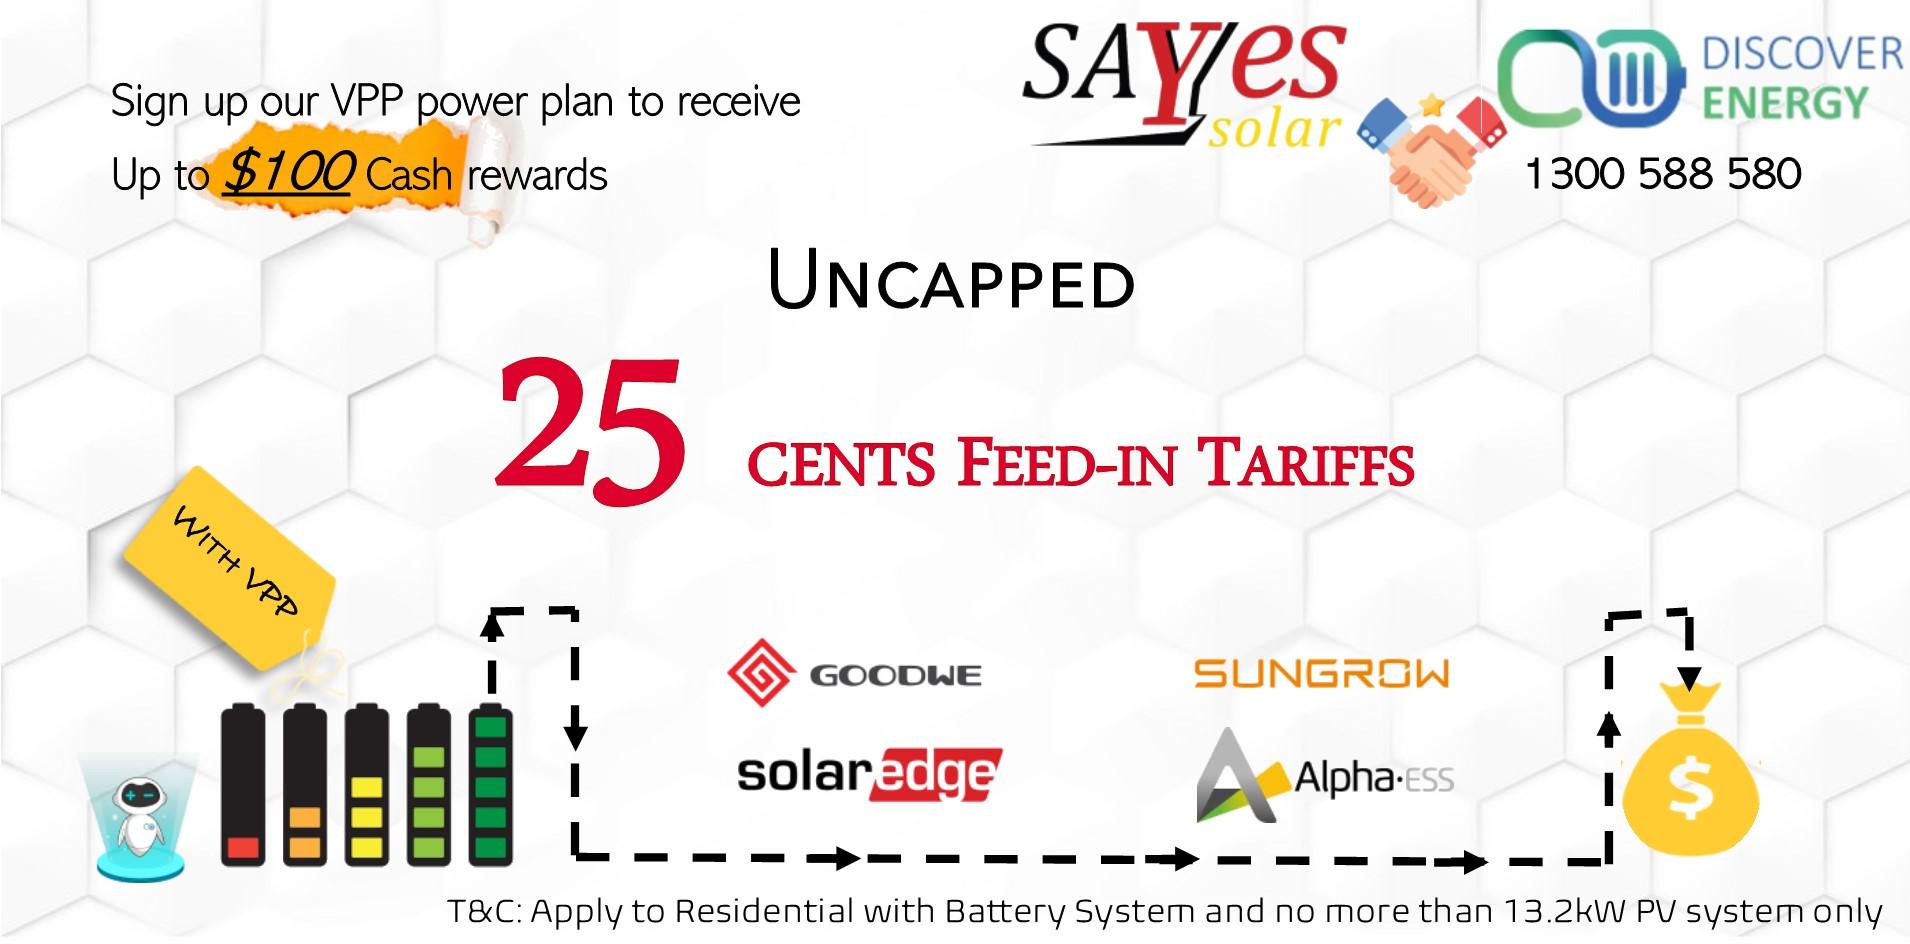 Feed-in tariffs, Solar Battery, VPP